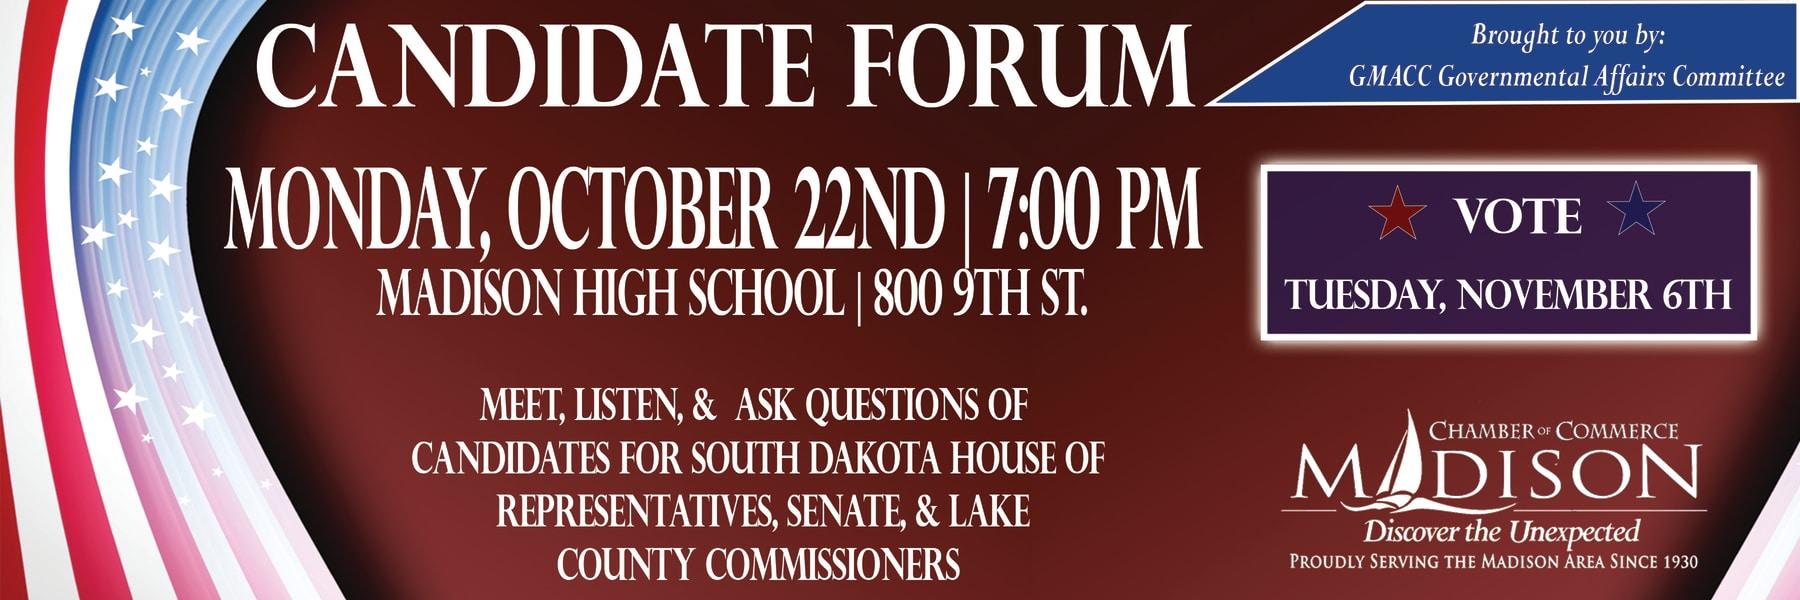 2018-Fall-Candidate-Forum-Banner(1)-w1800.jpg